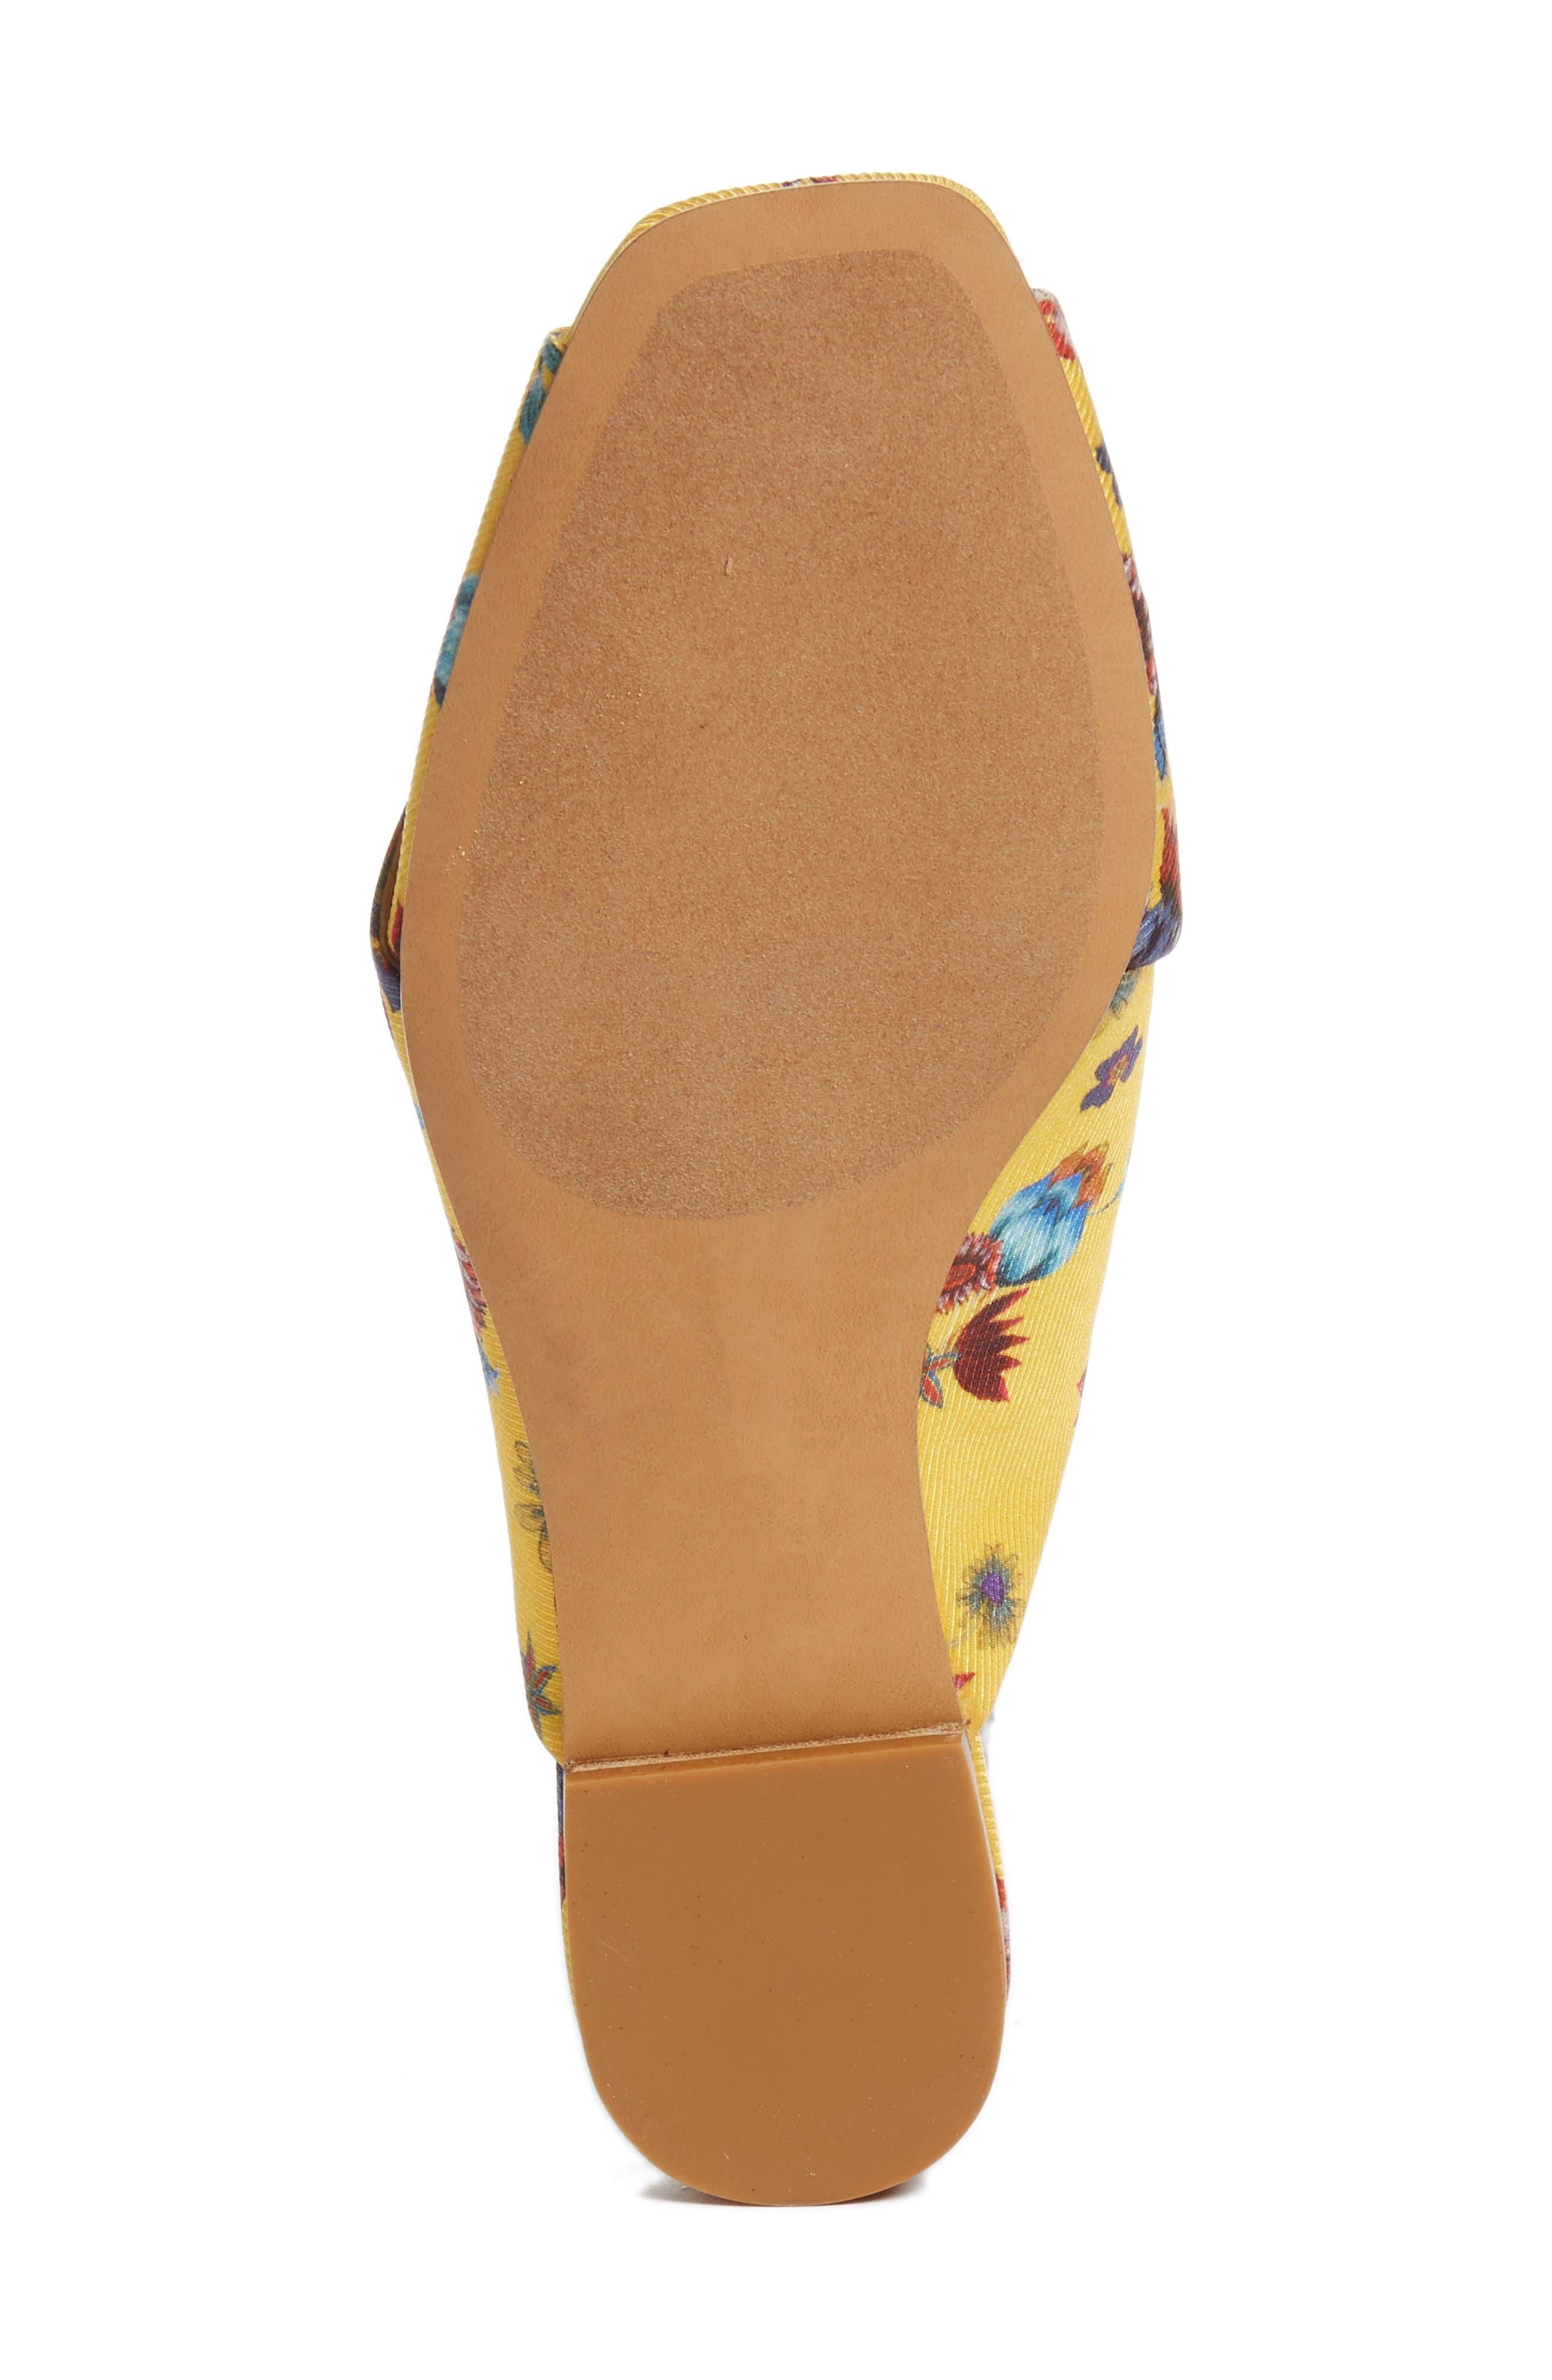 Anden Slide Sandal,                             Alternate thumbnail 6, color,                             Butterscotch Multi Print Silk